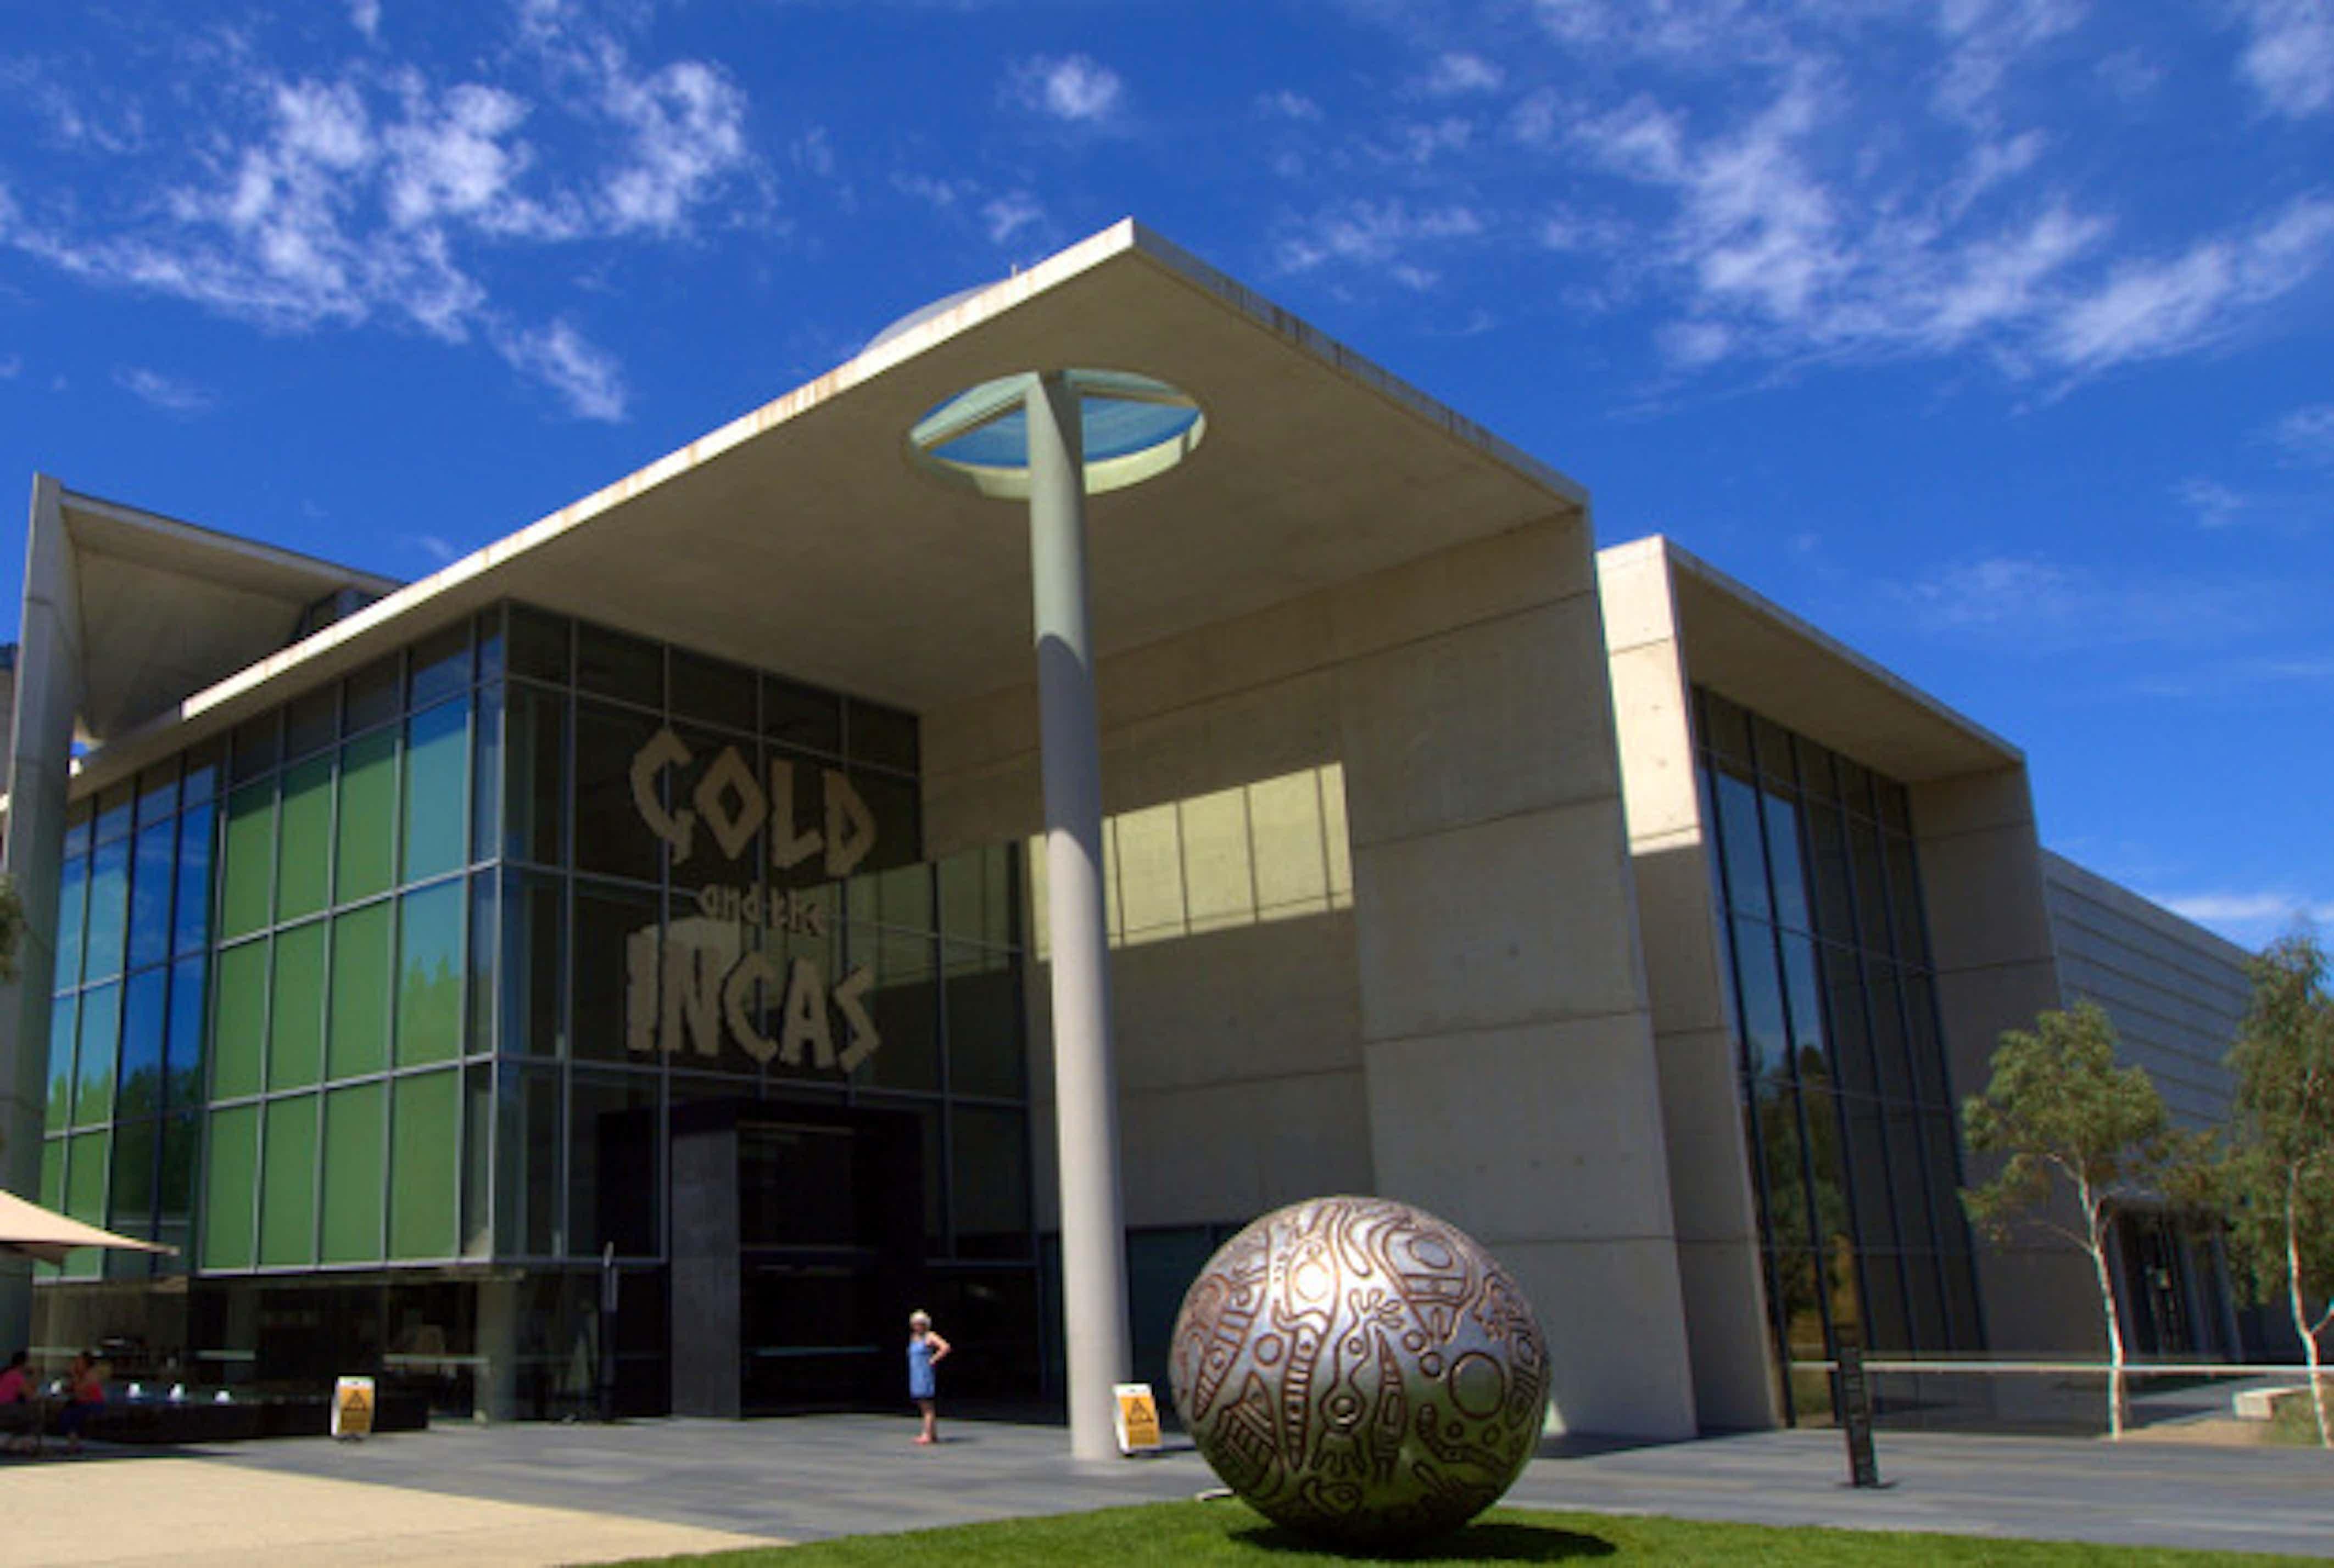 Australian Art Museum Offers First-Ever Nude Tours